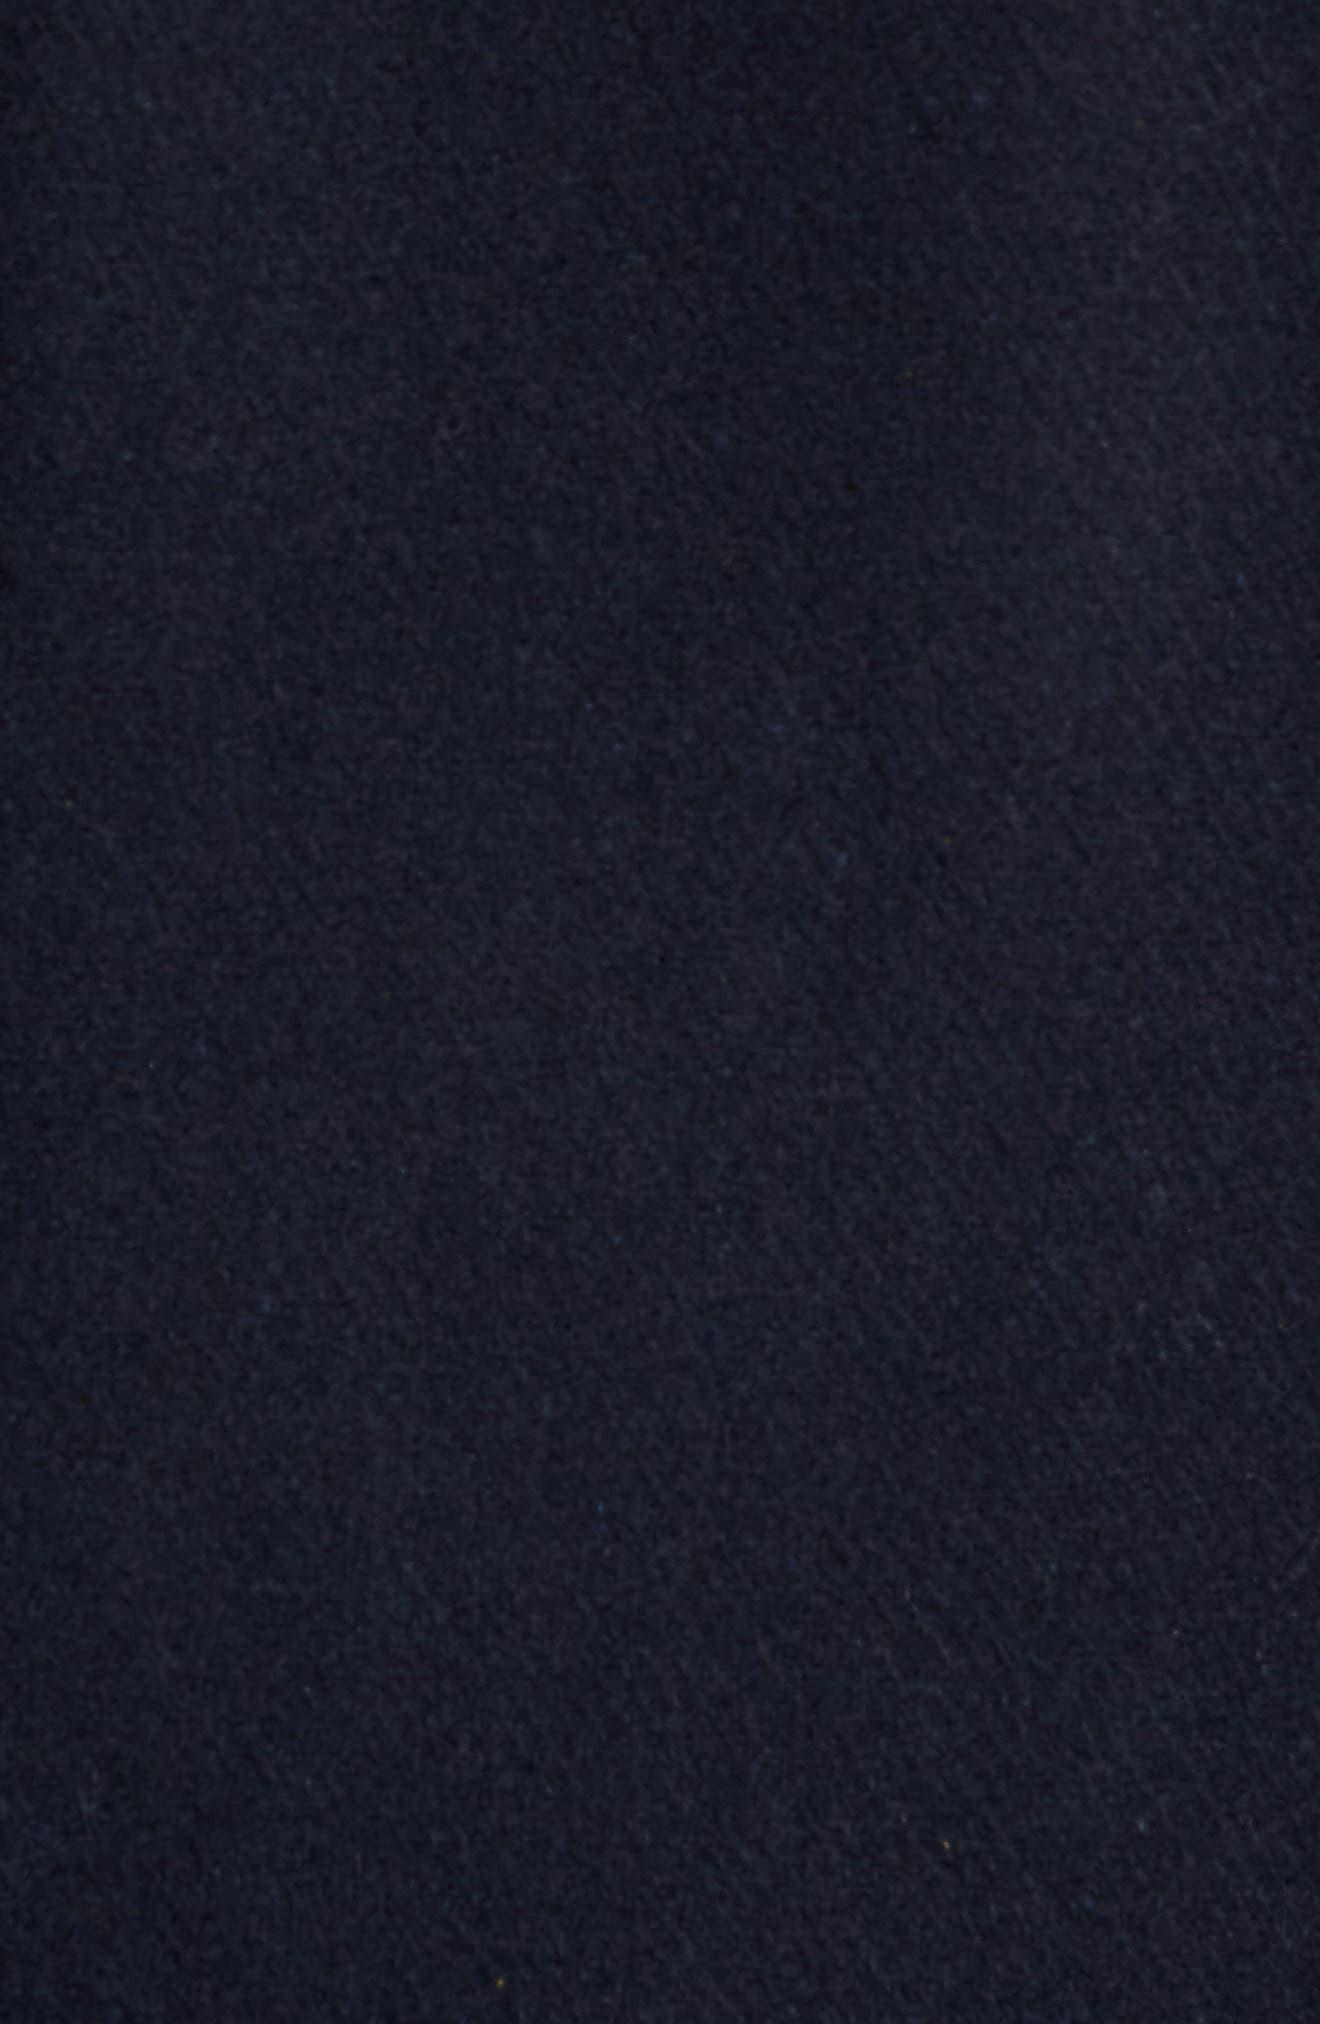 Wool Blend Peacoat,                             Alternate thumbnail 6, color,                             410